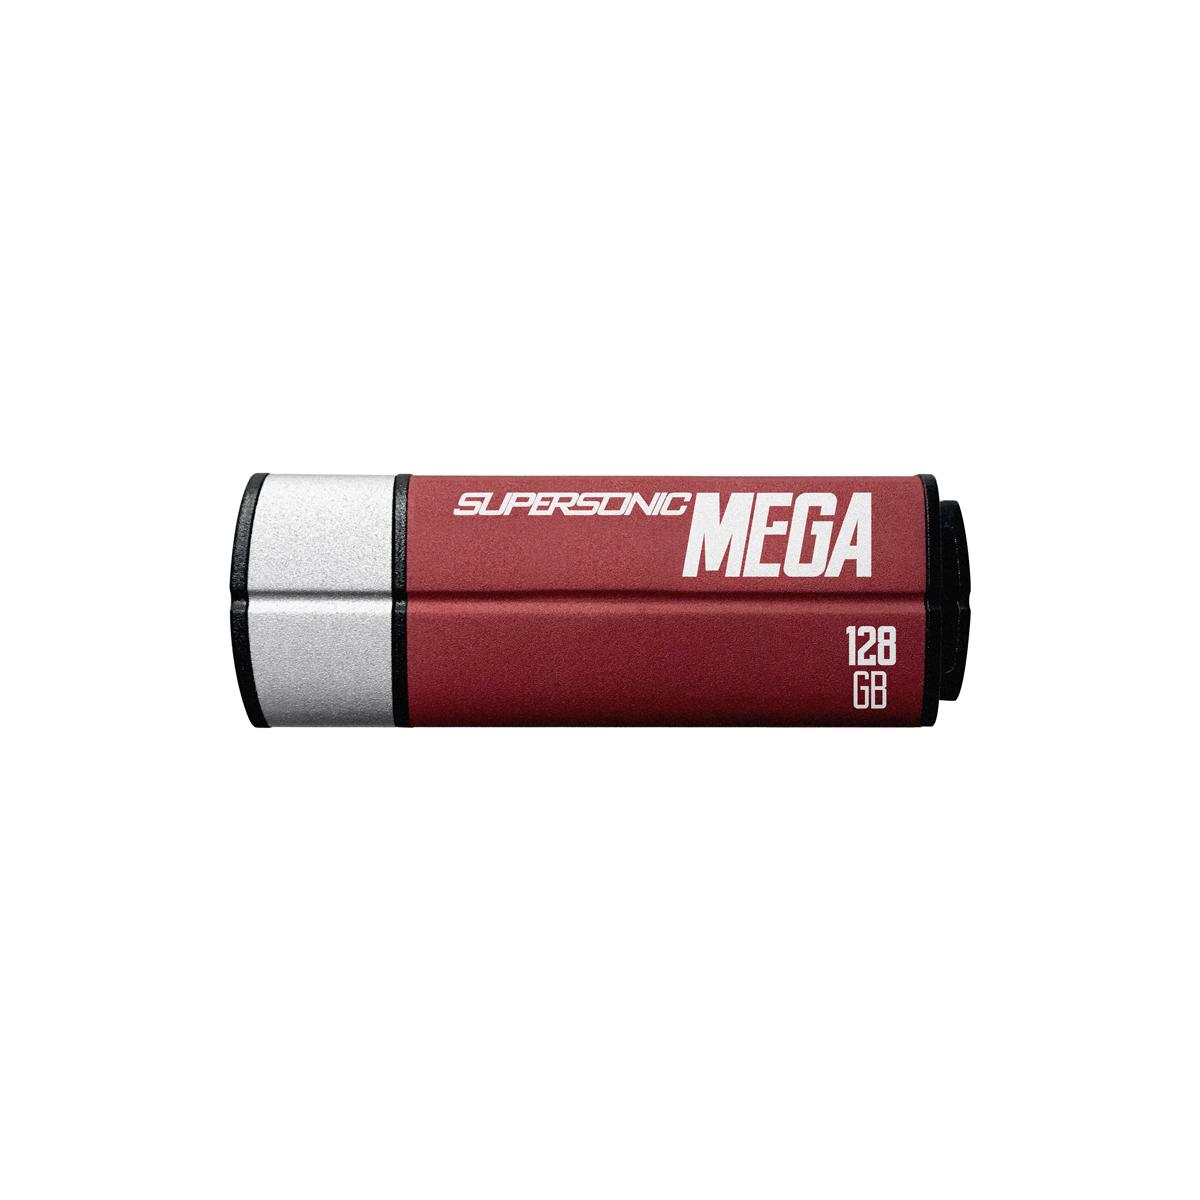 128GB Patriot Mega USB 3.1 380/70MBs